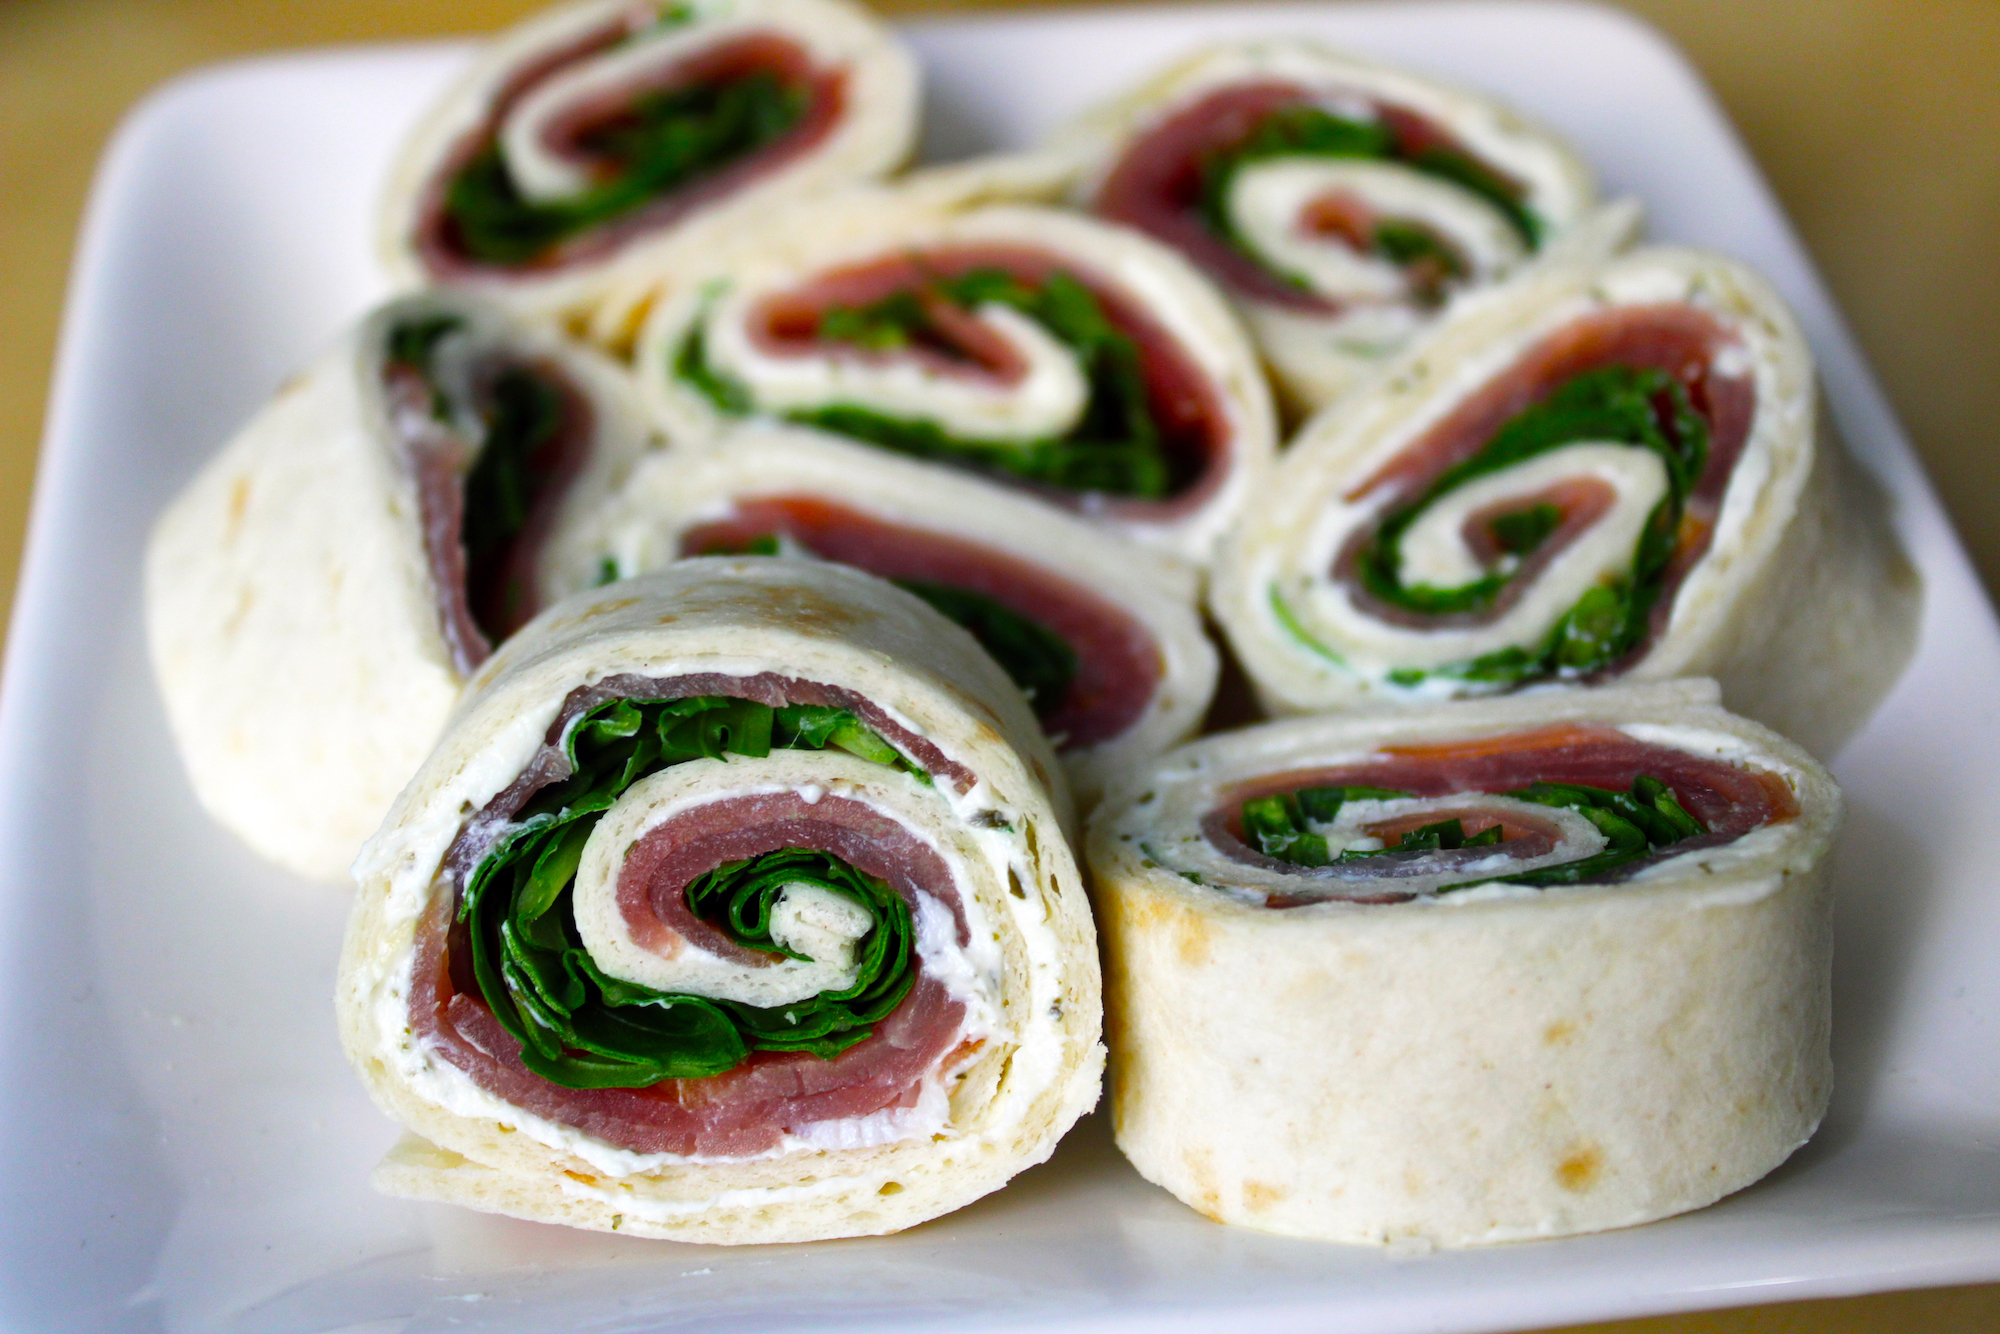 Lenterolletjes met gerookte ham en rucola